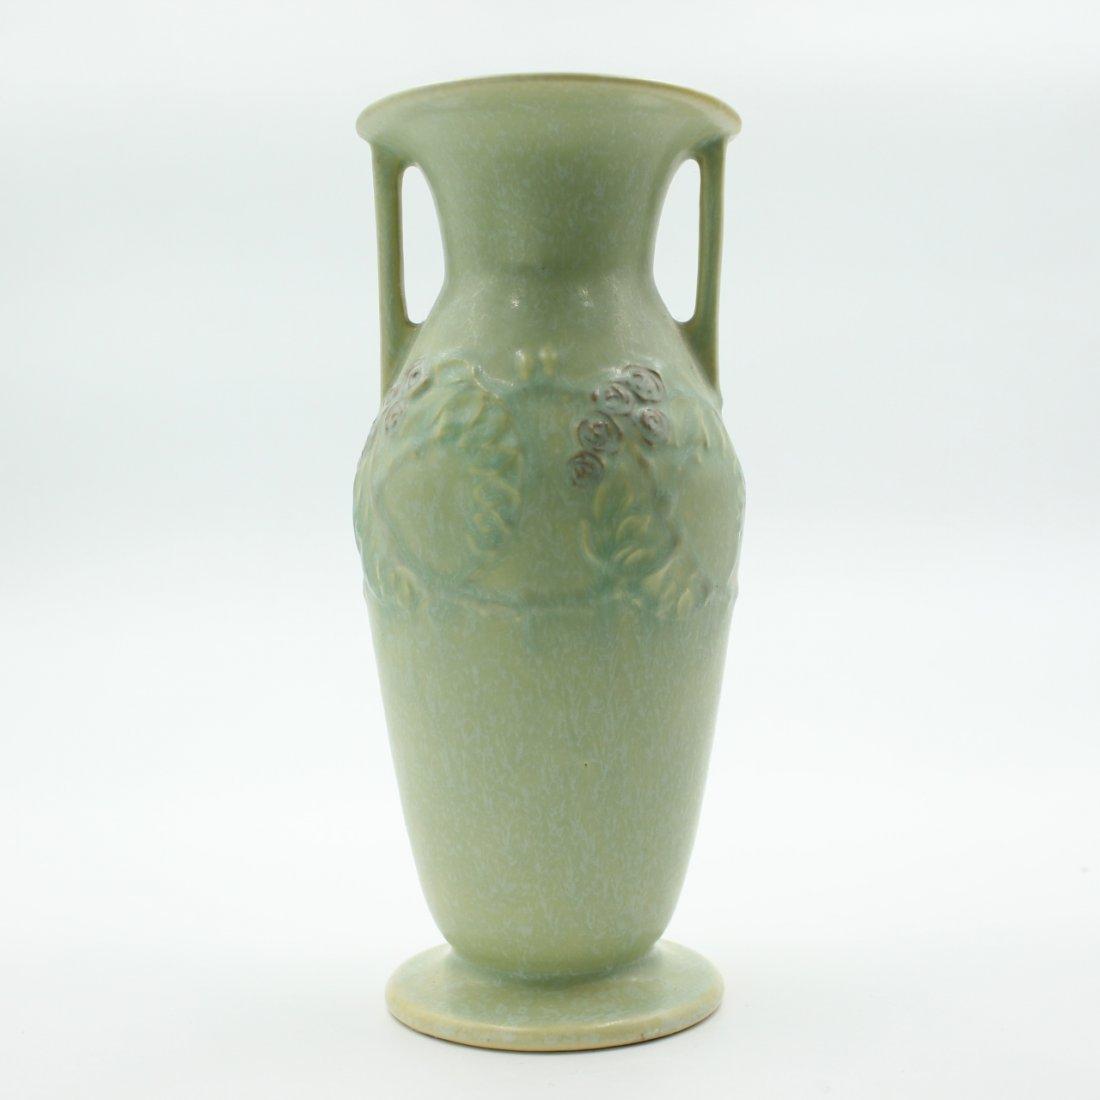 C. 1927 Roseville Cremona Vase #357-8